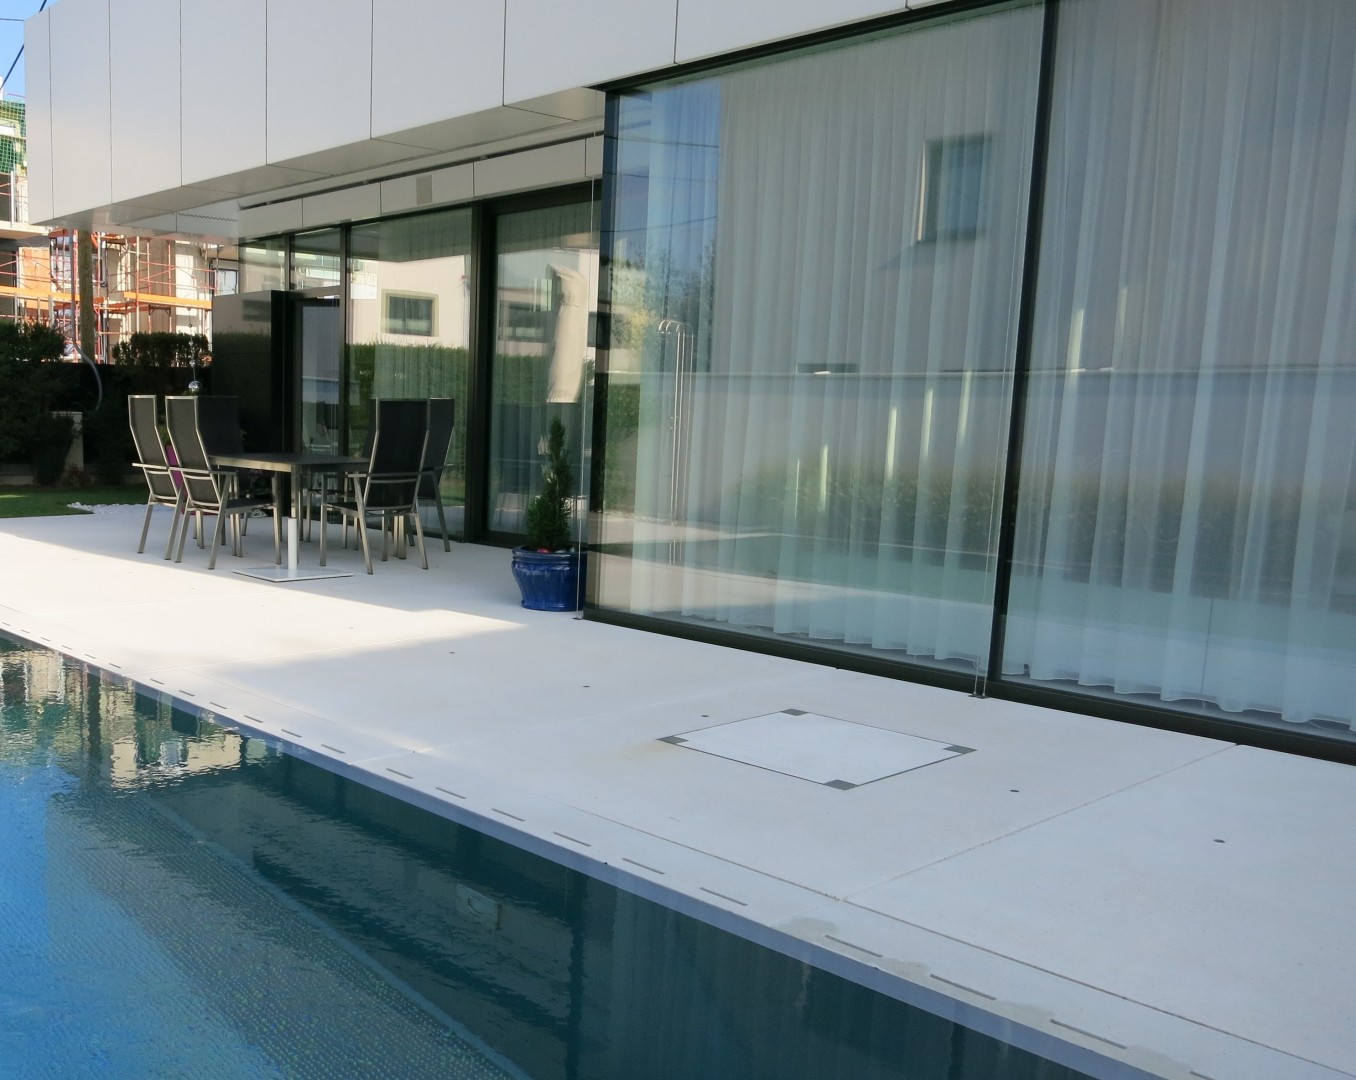 Exklusive, moderne Designervilla mit Pool -  Nähe Alte Donau